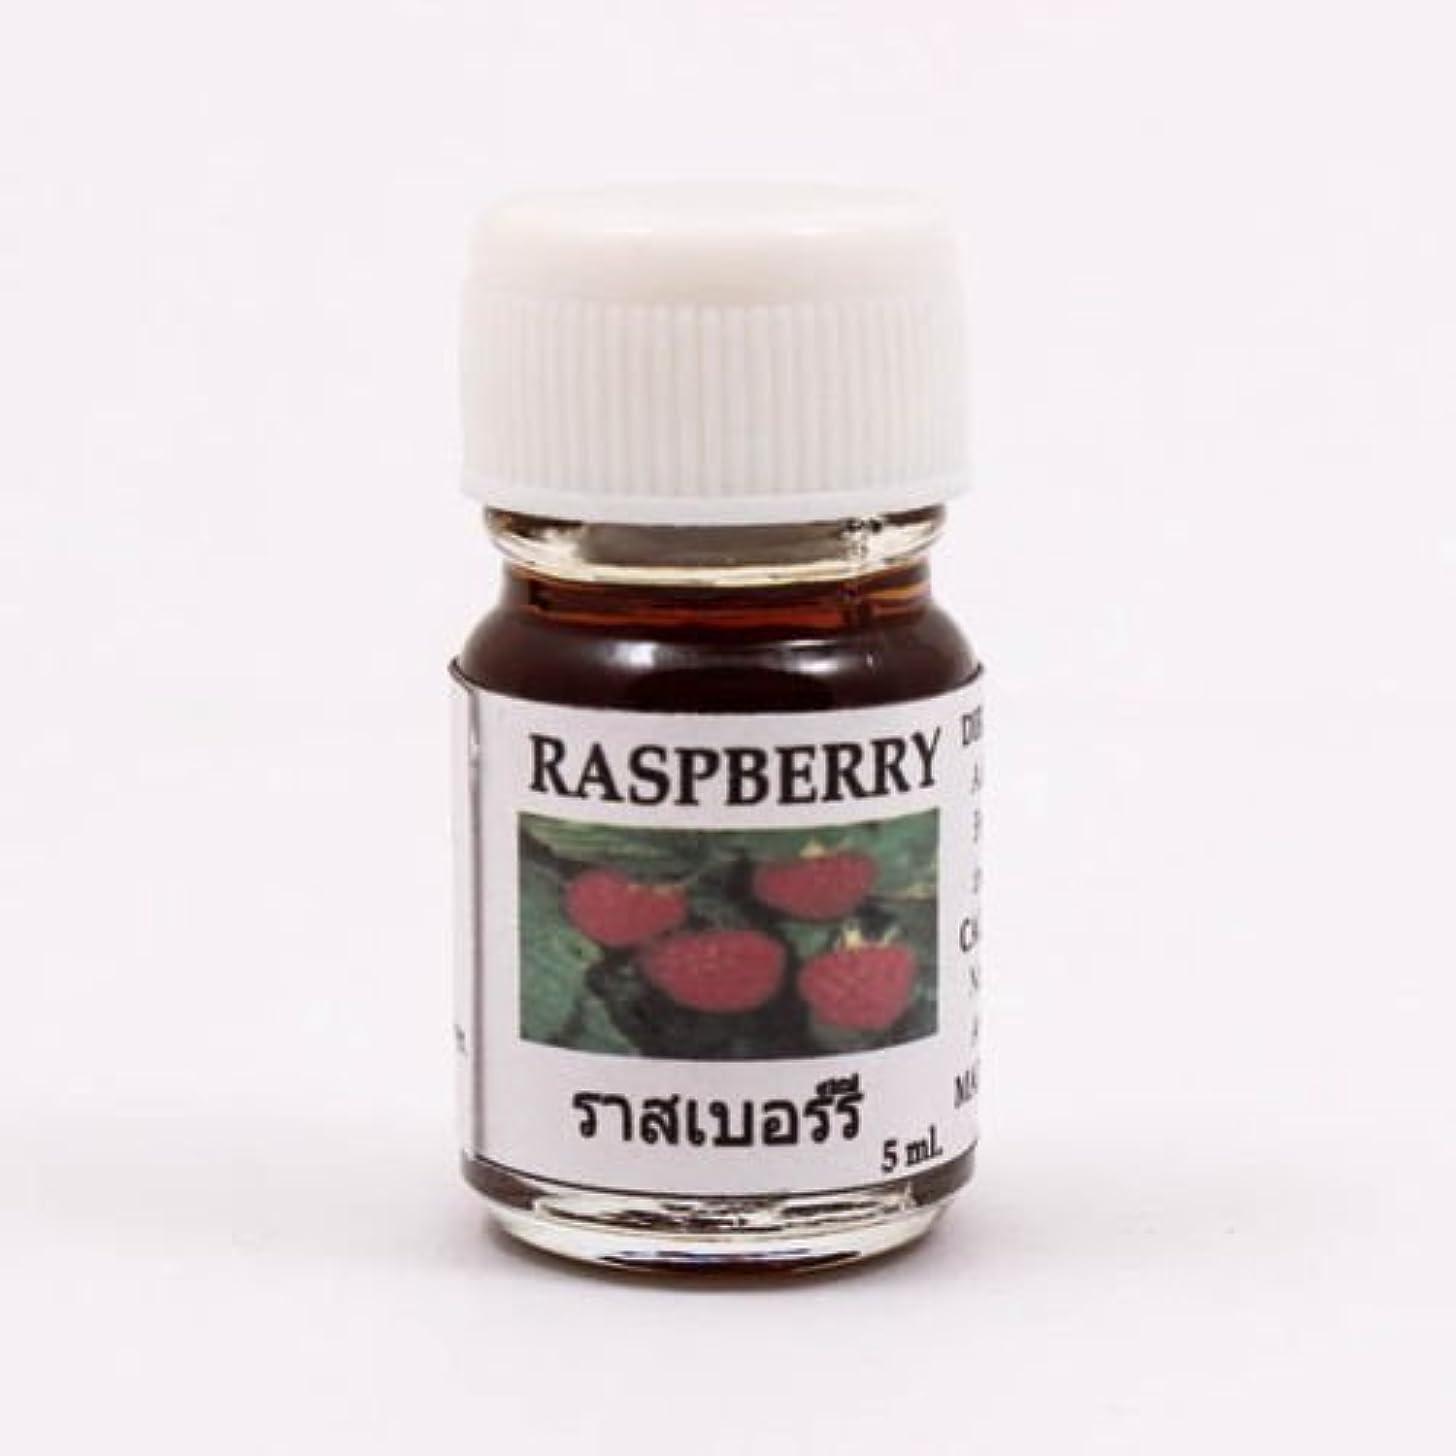 6X Raspberry Aroma Fragrance Essential Oil 5ML cc Diffuser Burner Therapy